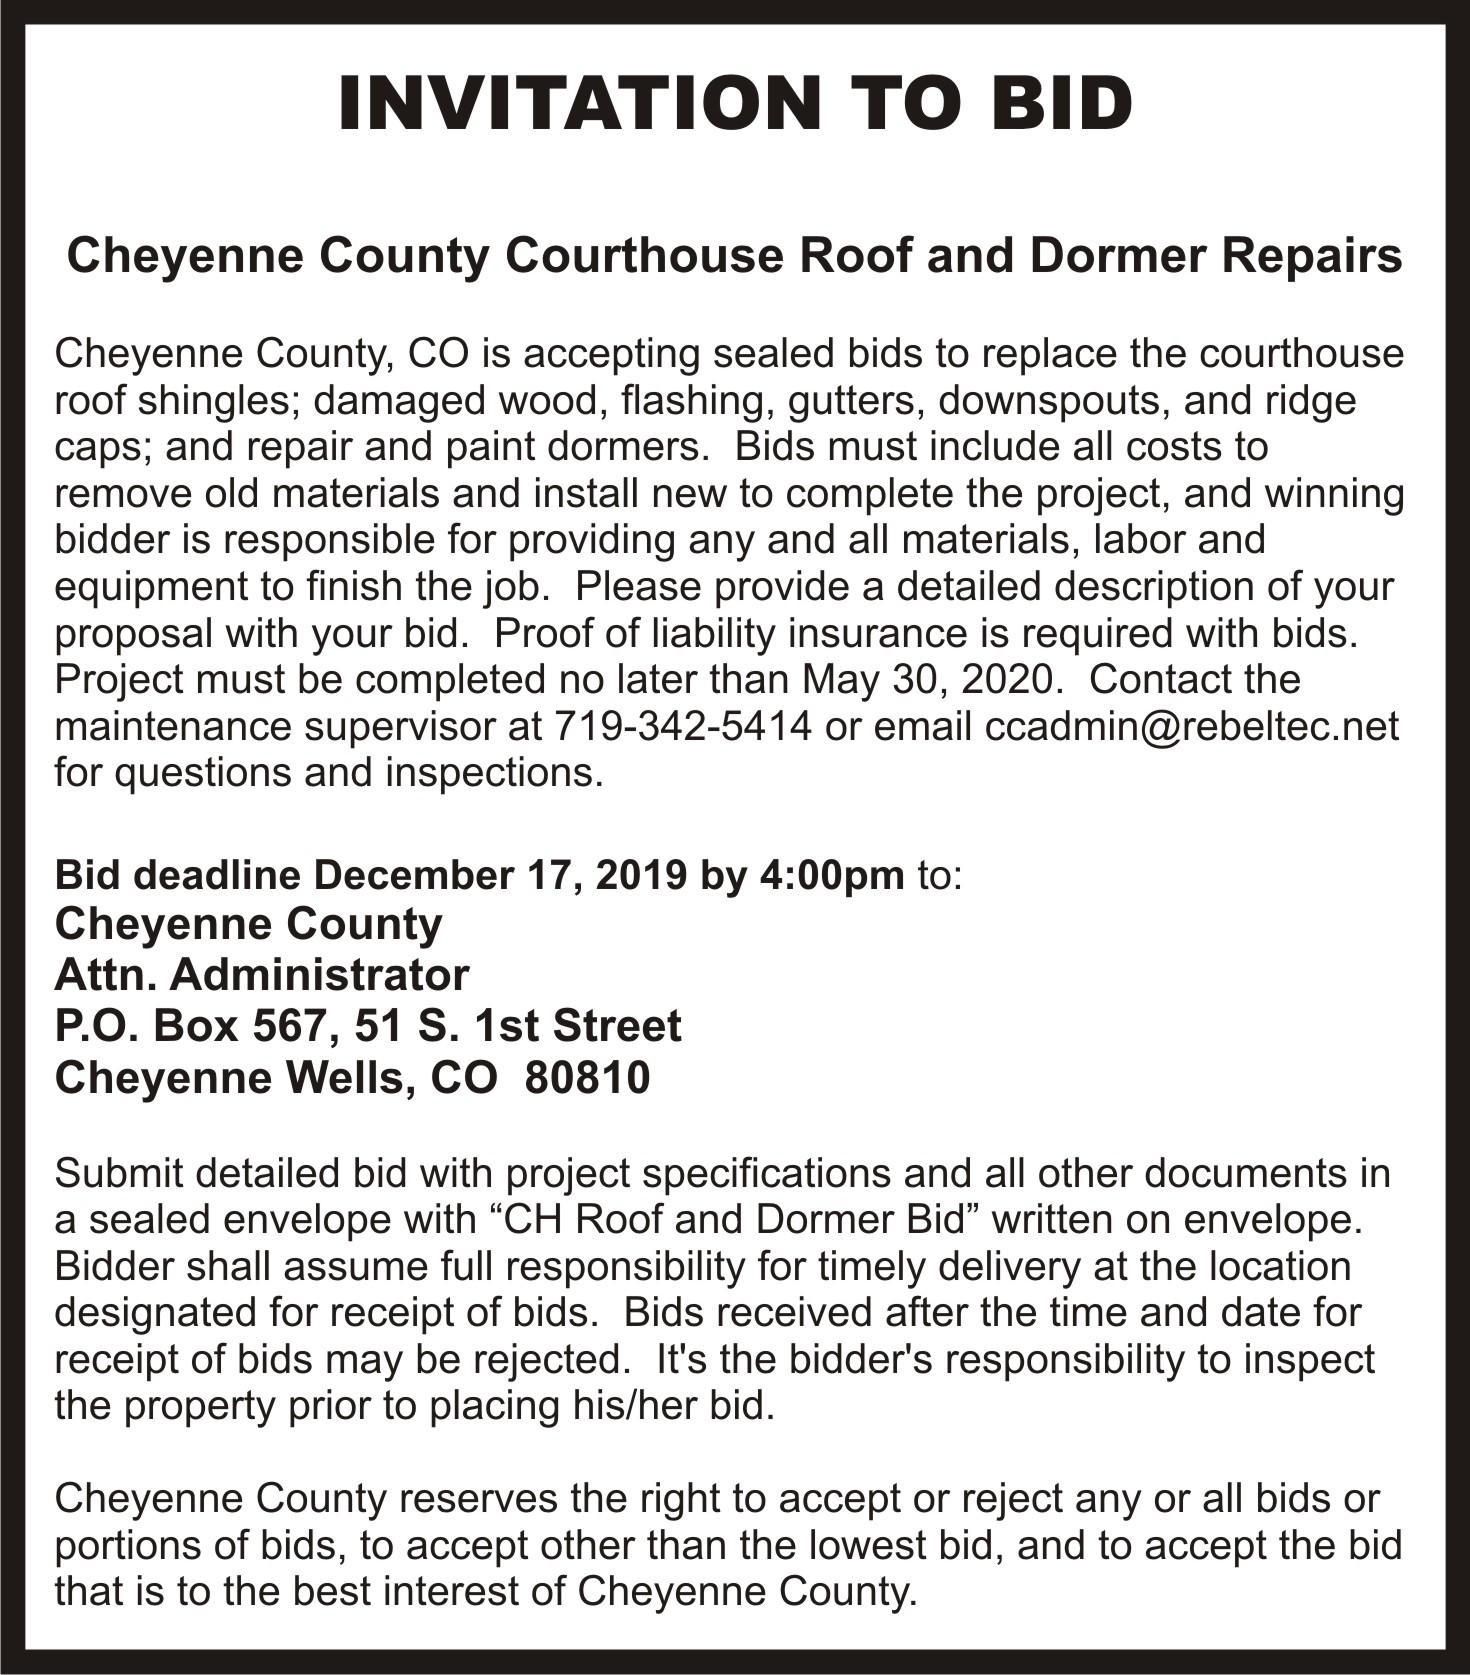 AD 2019-11 Bids Accepted - Cheyenne County